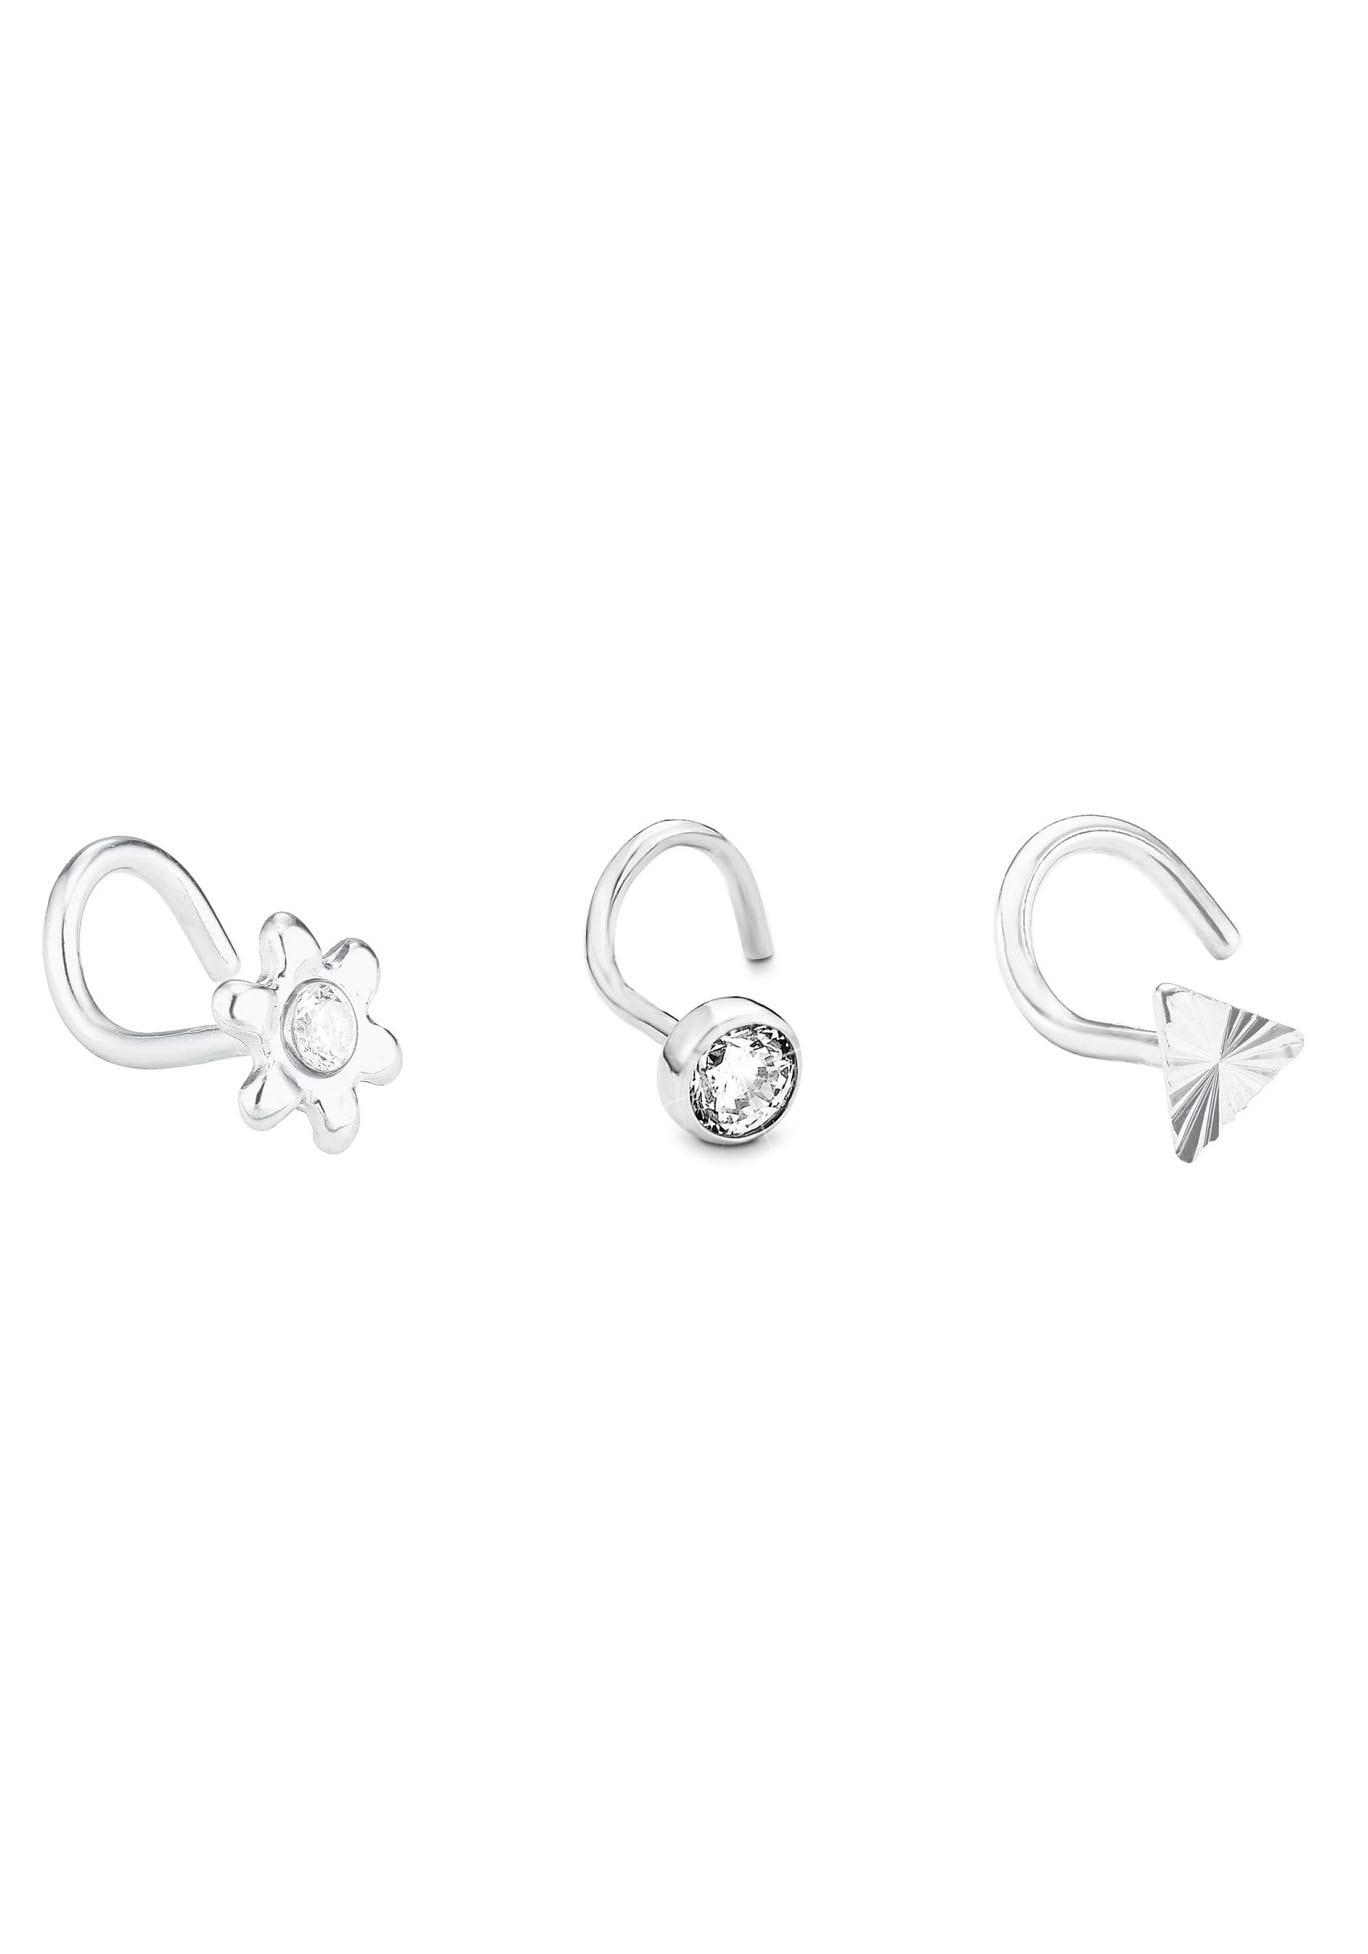 Amor Piercing-Set Blume| Dreieck| 2027097 (Set| 3 tlg.) | Schmuck > Piercings | Amor